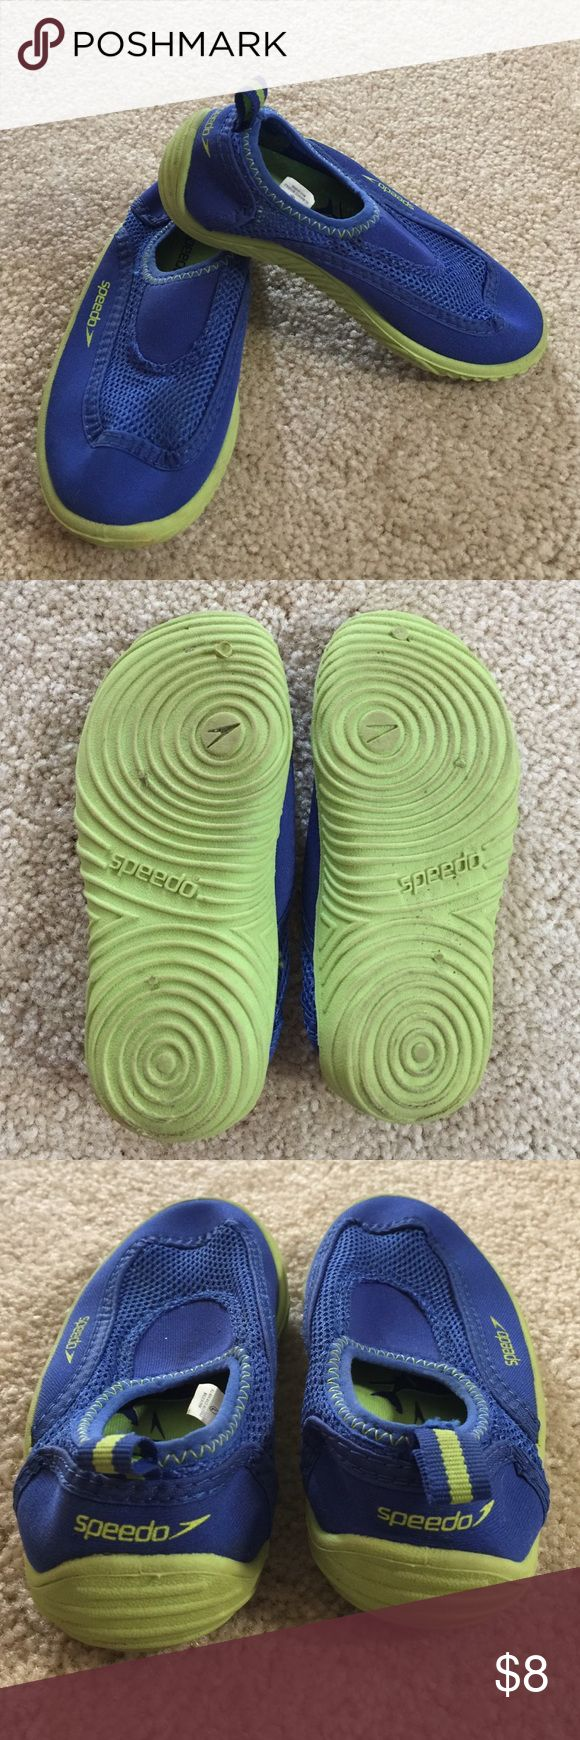 Speedo Water Shoes Toddler Boys Speedo Water Shoes. Size L (9/10) Speedo Shoes Water Shoes